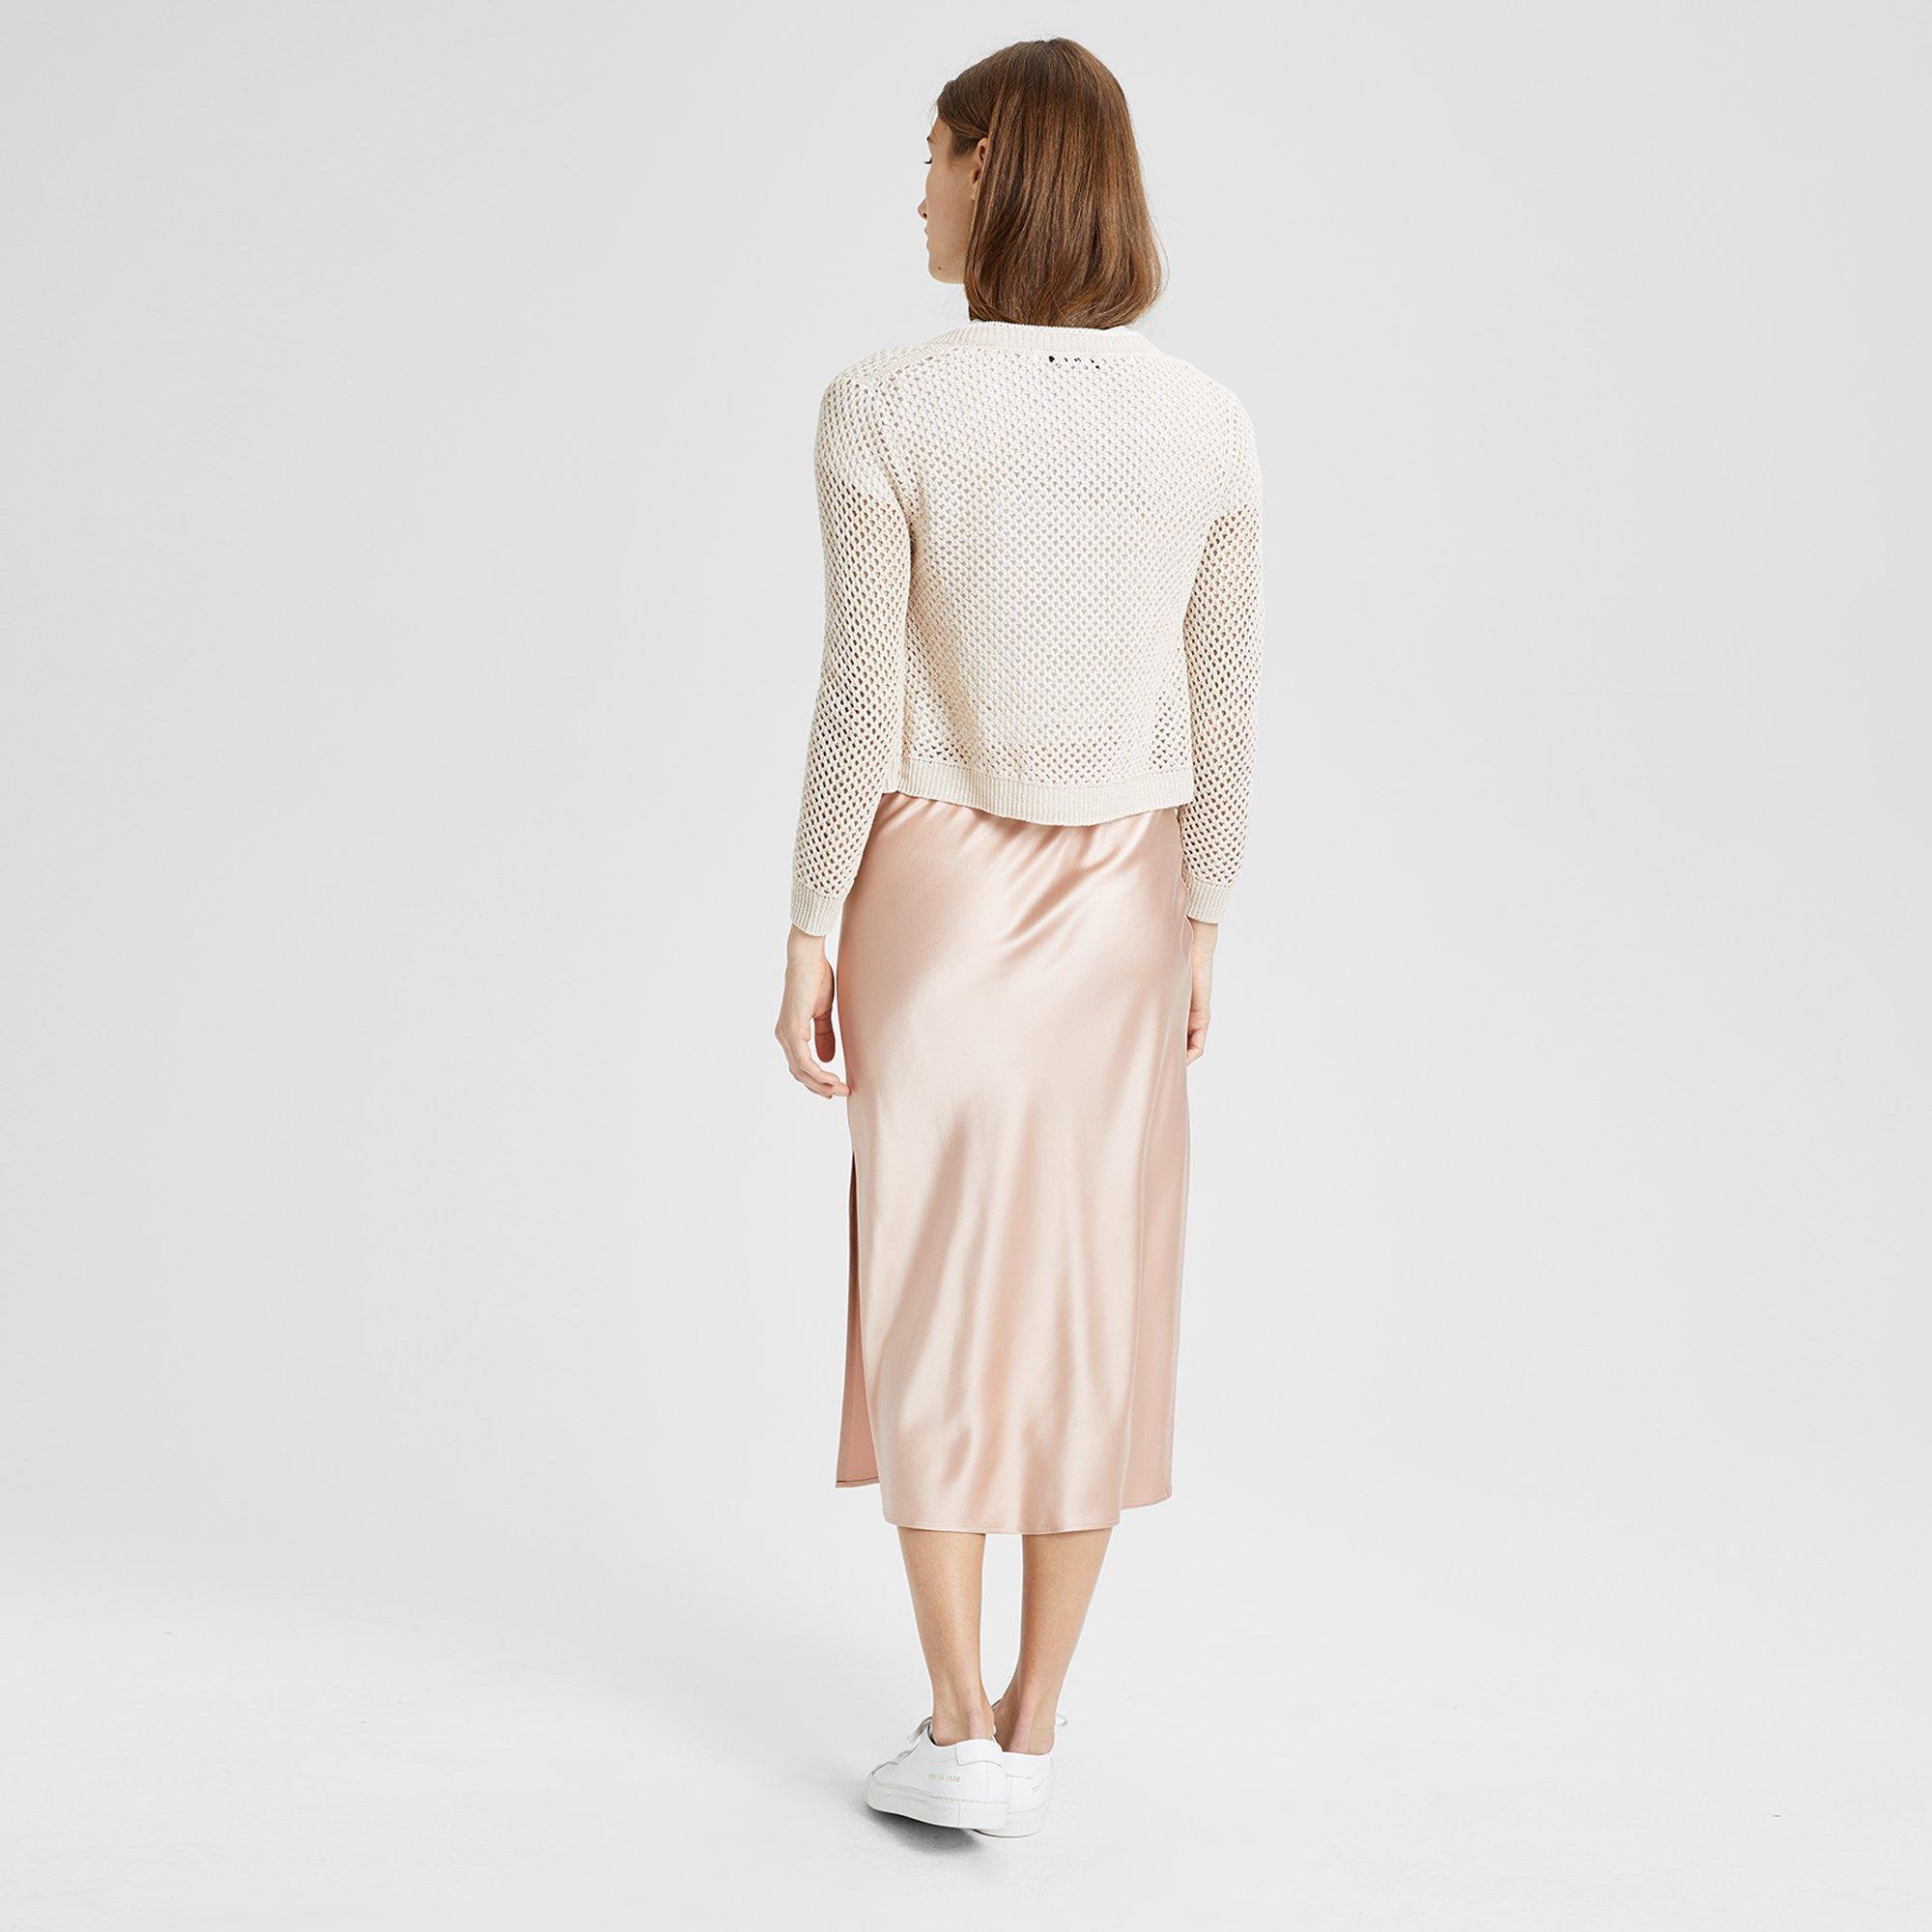 271b59555caf Theory - White Silk Satin Pull-on Slip Skirt - Lyst. View fullscreen